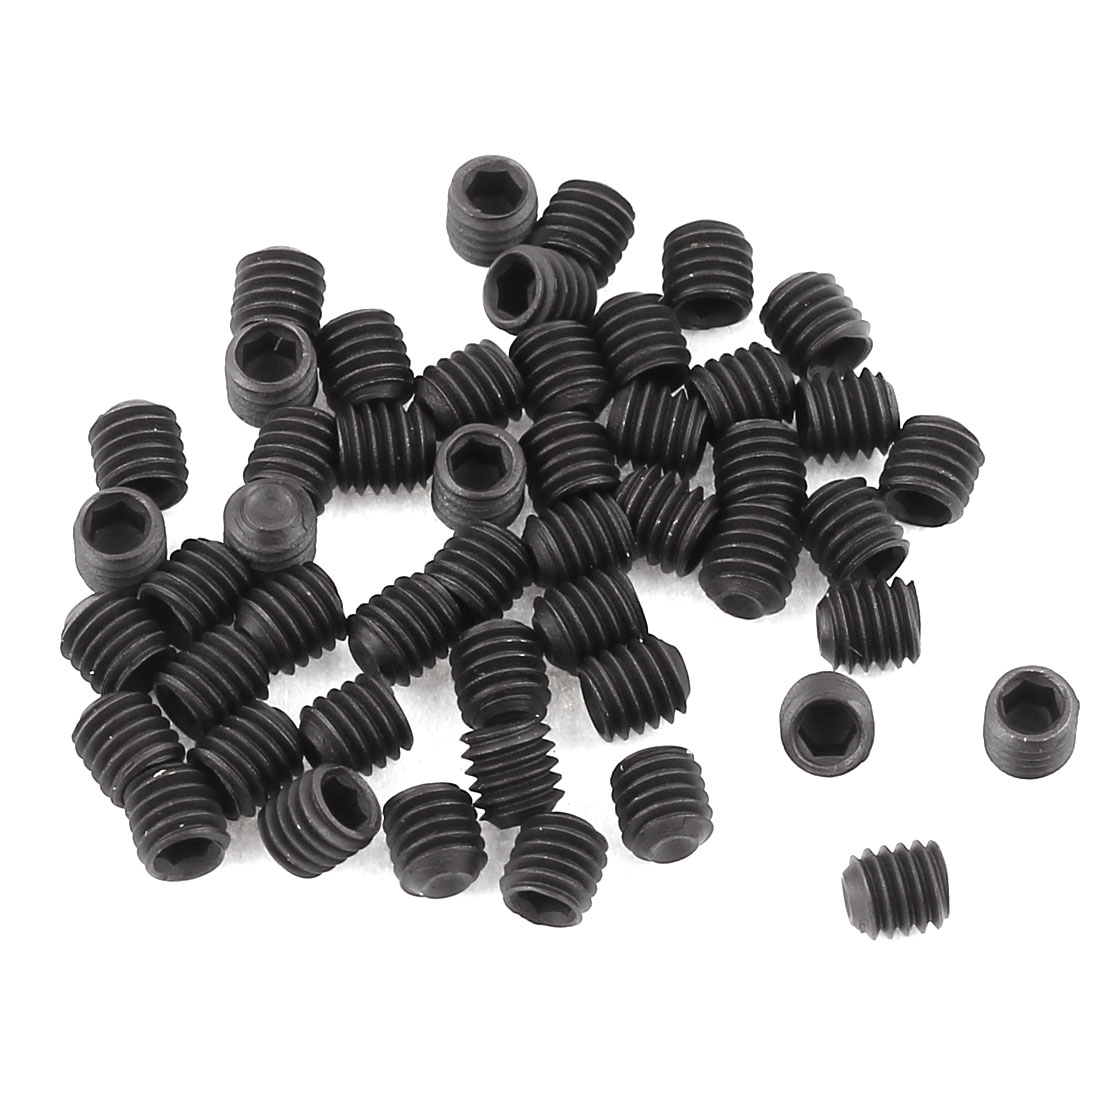 50 Pcs 3 x 3mm Thread Hexagon Socket Drive Cup Point Head Grub Screws